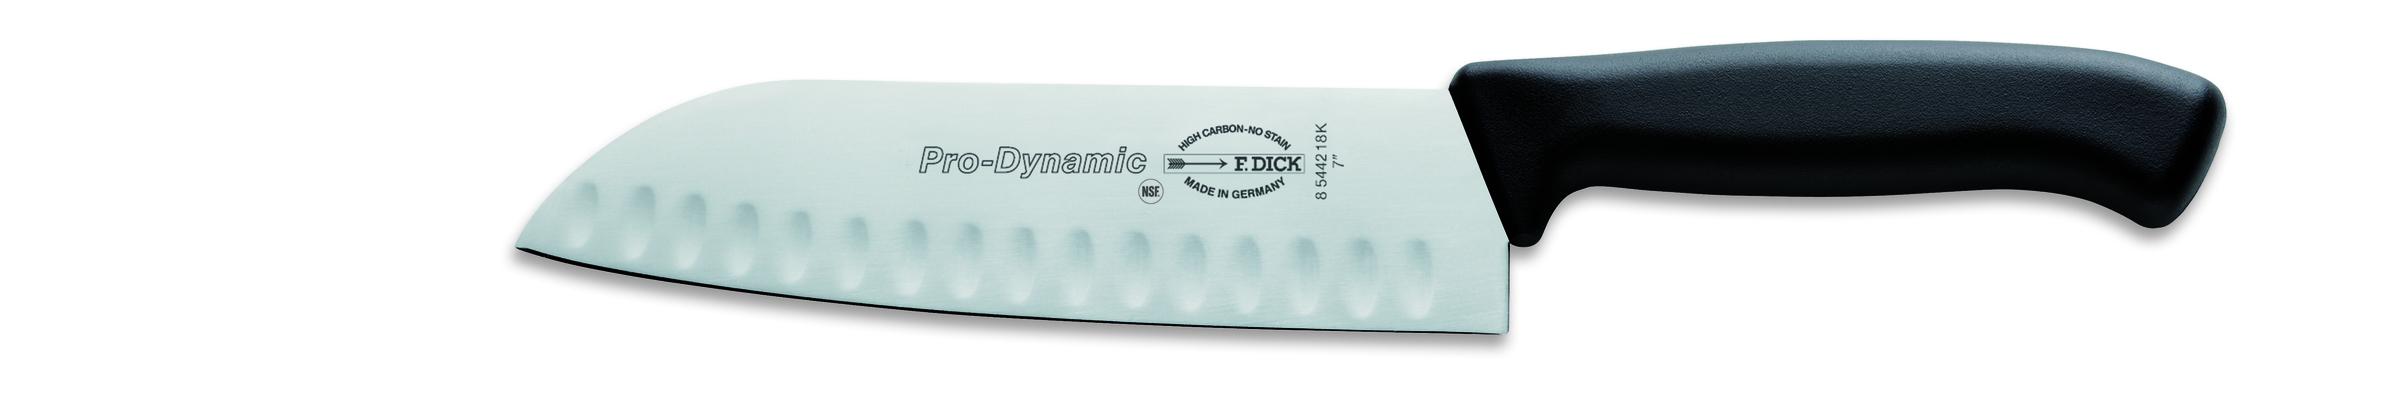 F.DICK, Santoku Knife, 18cm (7''), Black Handle (ProDynamic)